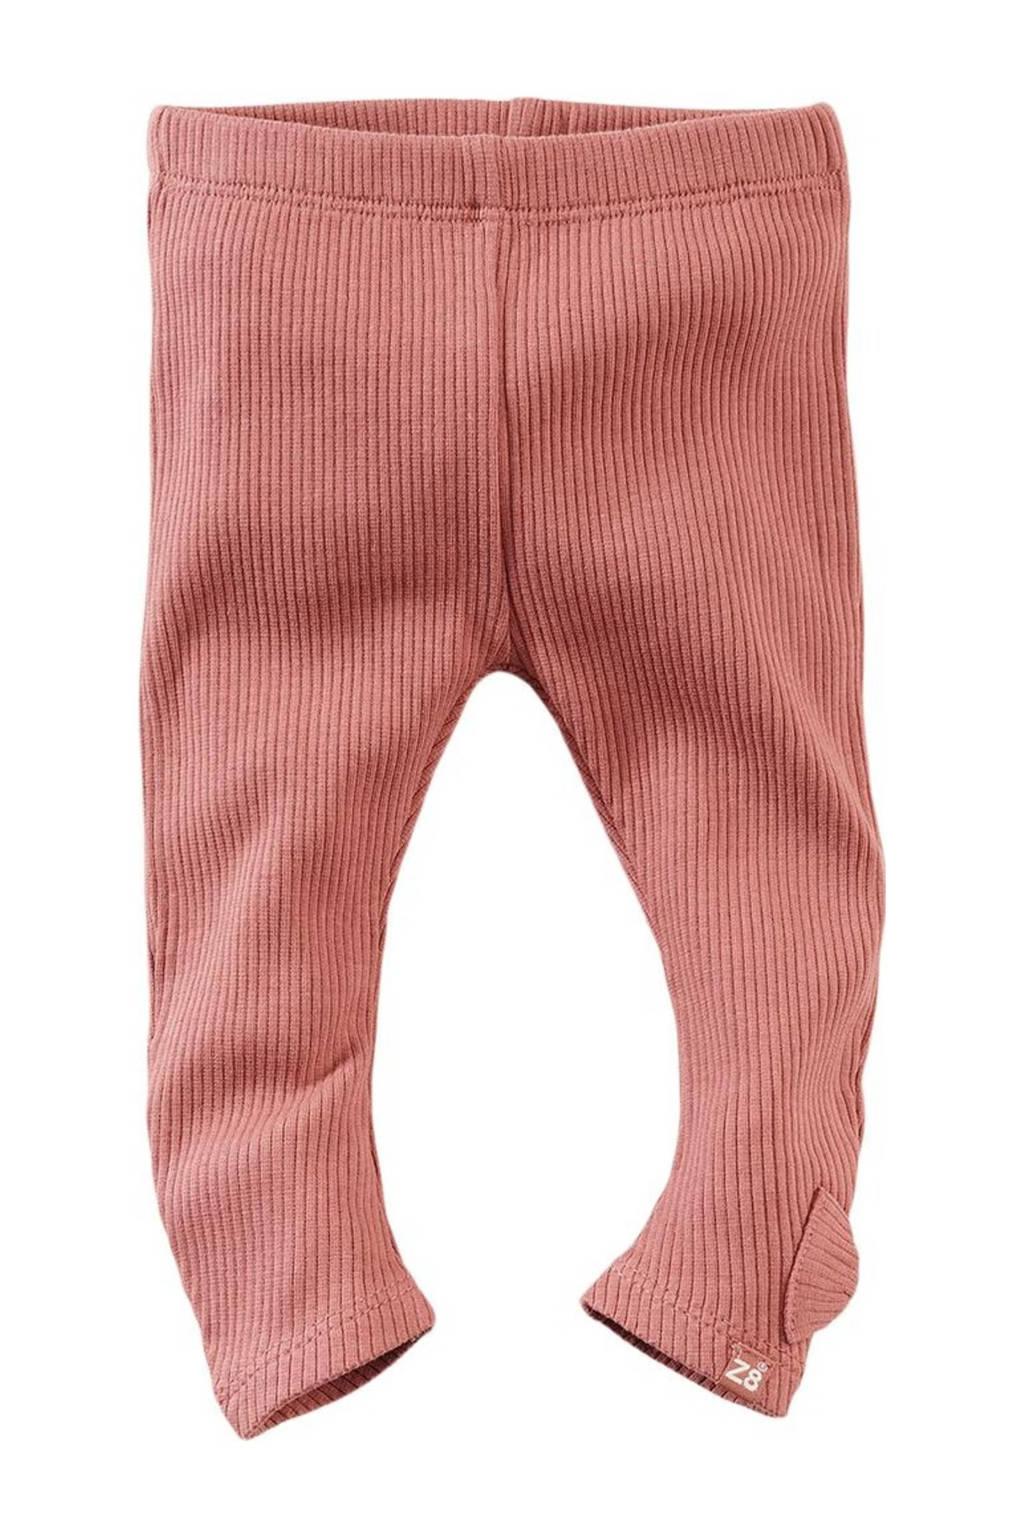 Z8 baby legging Panay oudroze, Oudroze